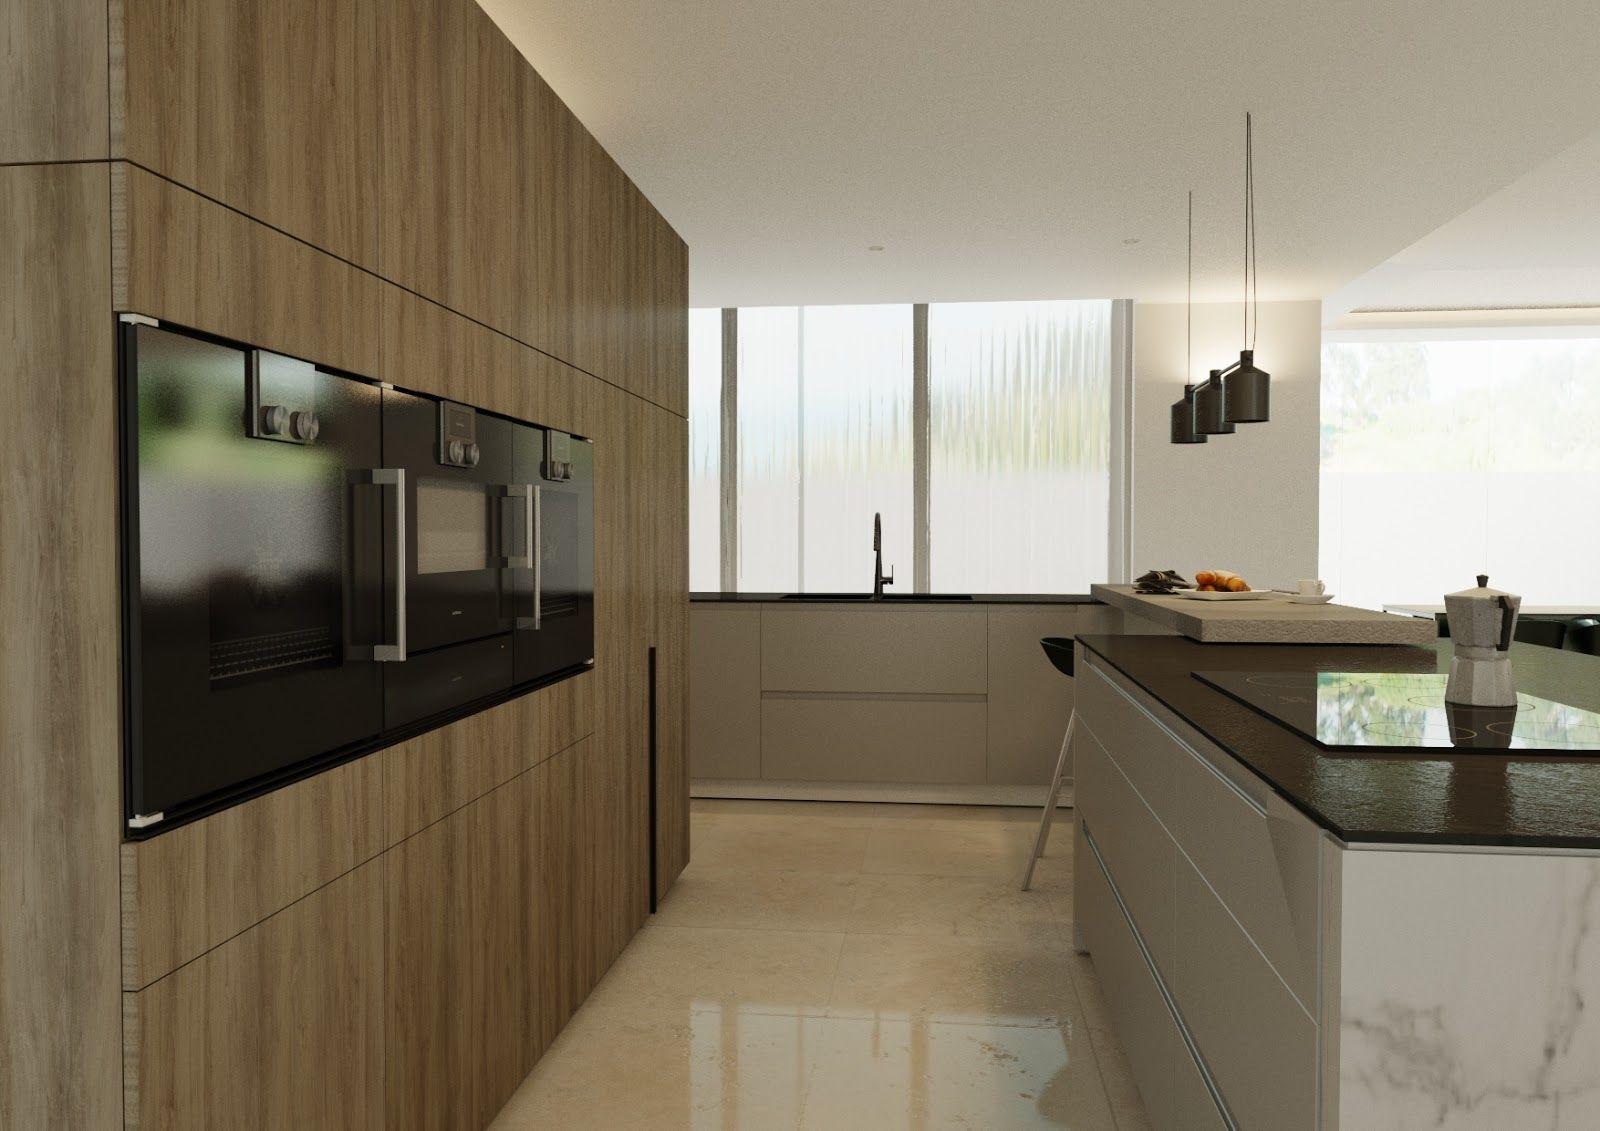 Modern kitchen and bathroom design solutionsaward winning